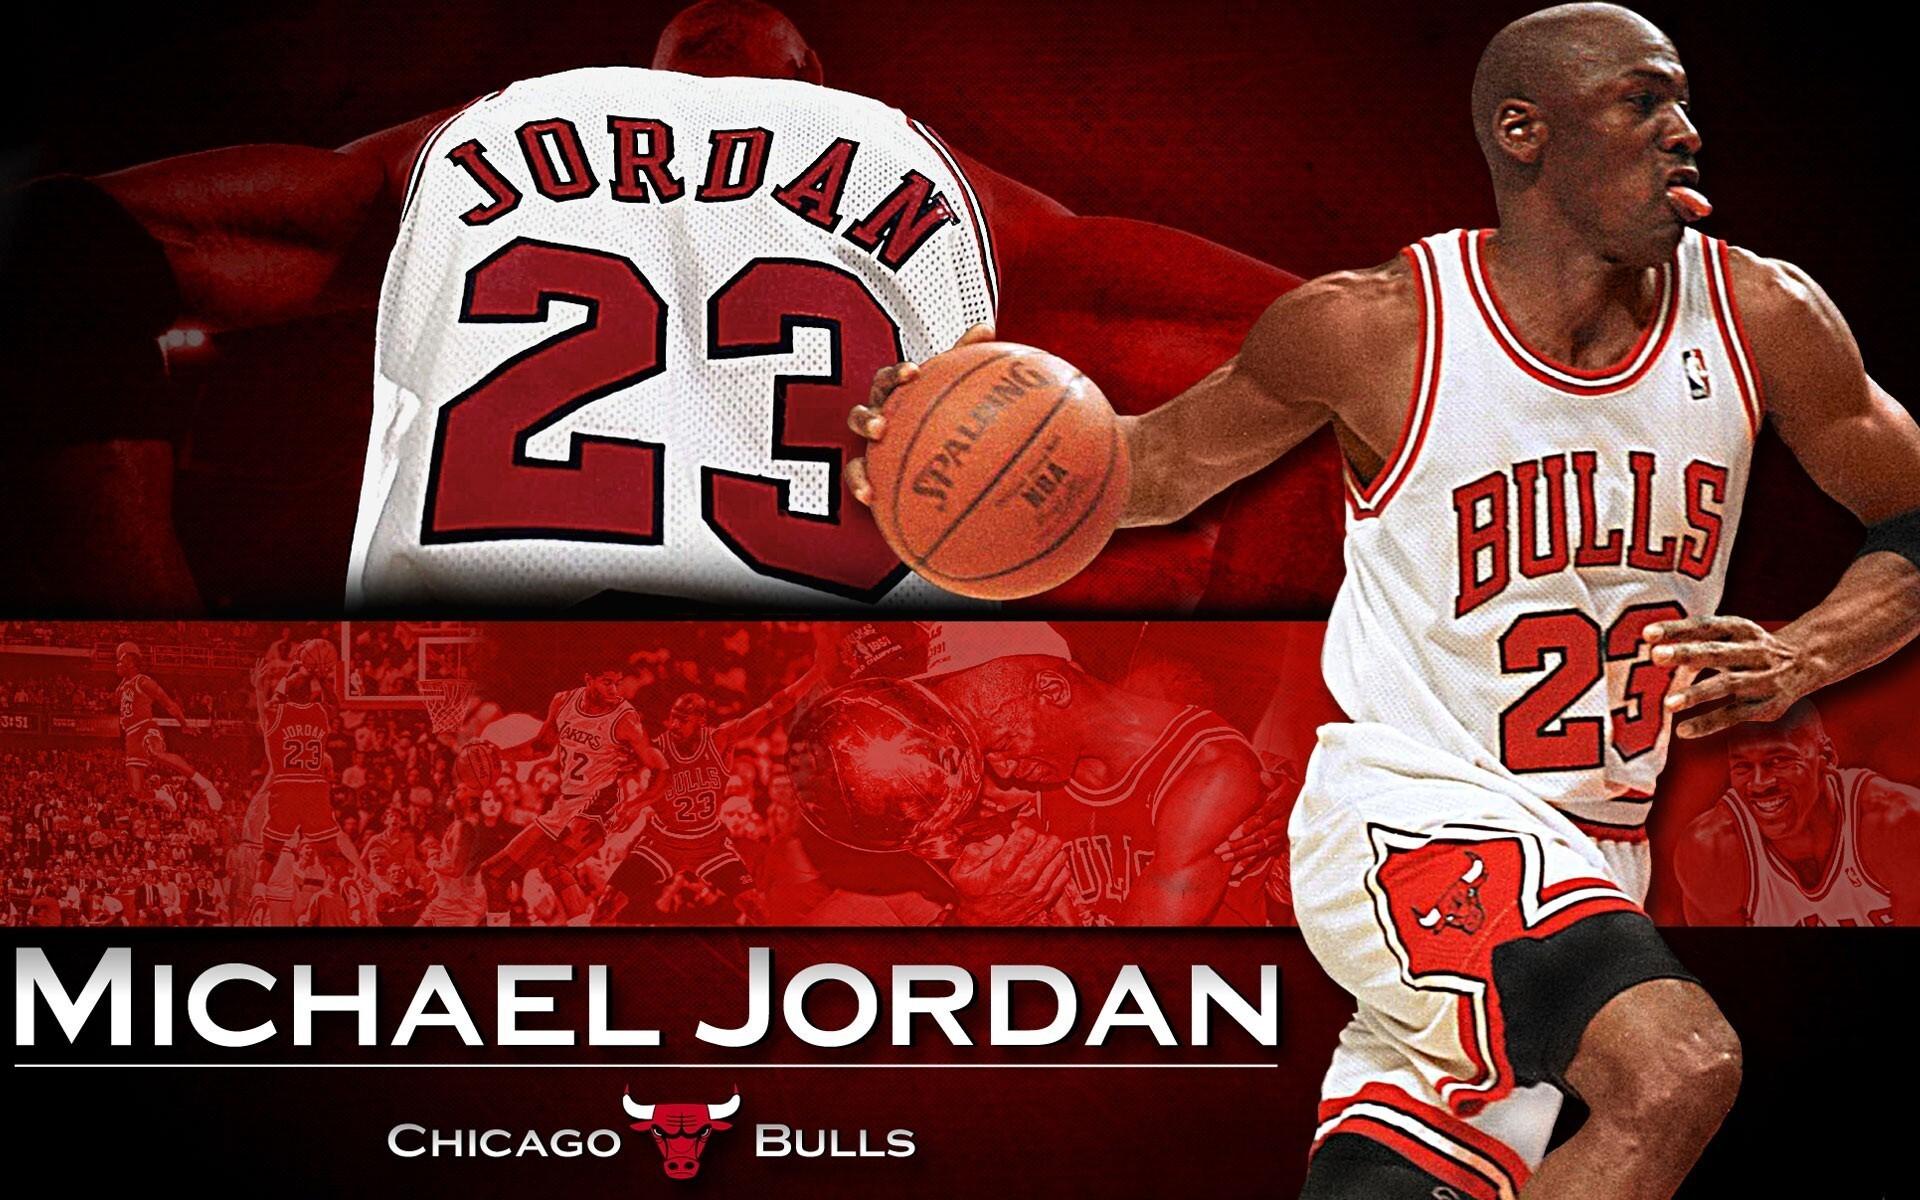 Michael jordan basketball olympic player hd wallpapers basketball wallpapers voltagebd Choice Image